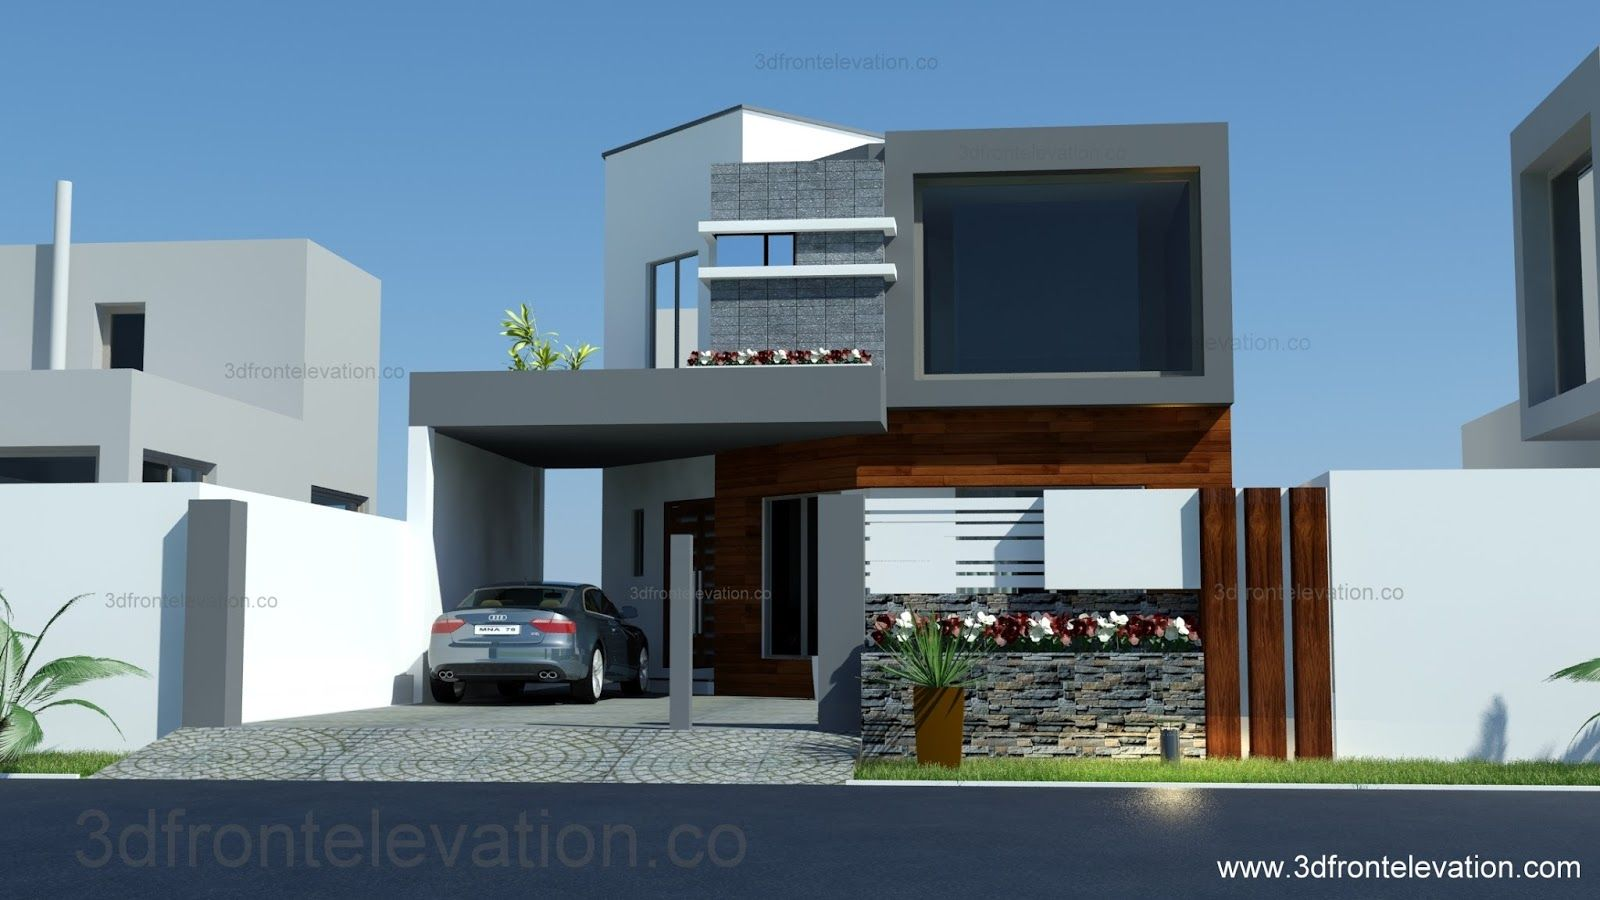 8 Marla House Plan-Layout-Elevation | Fachadas | Pinterest ...